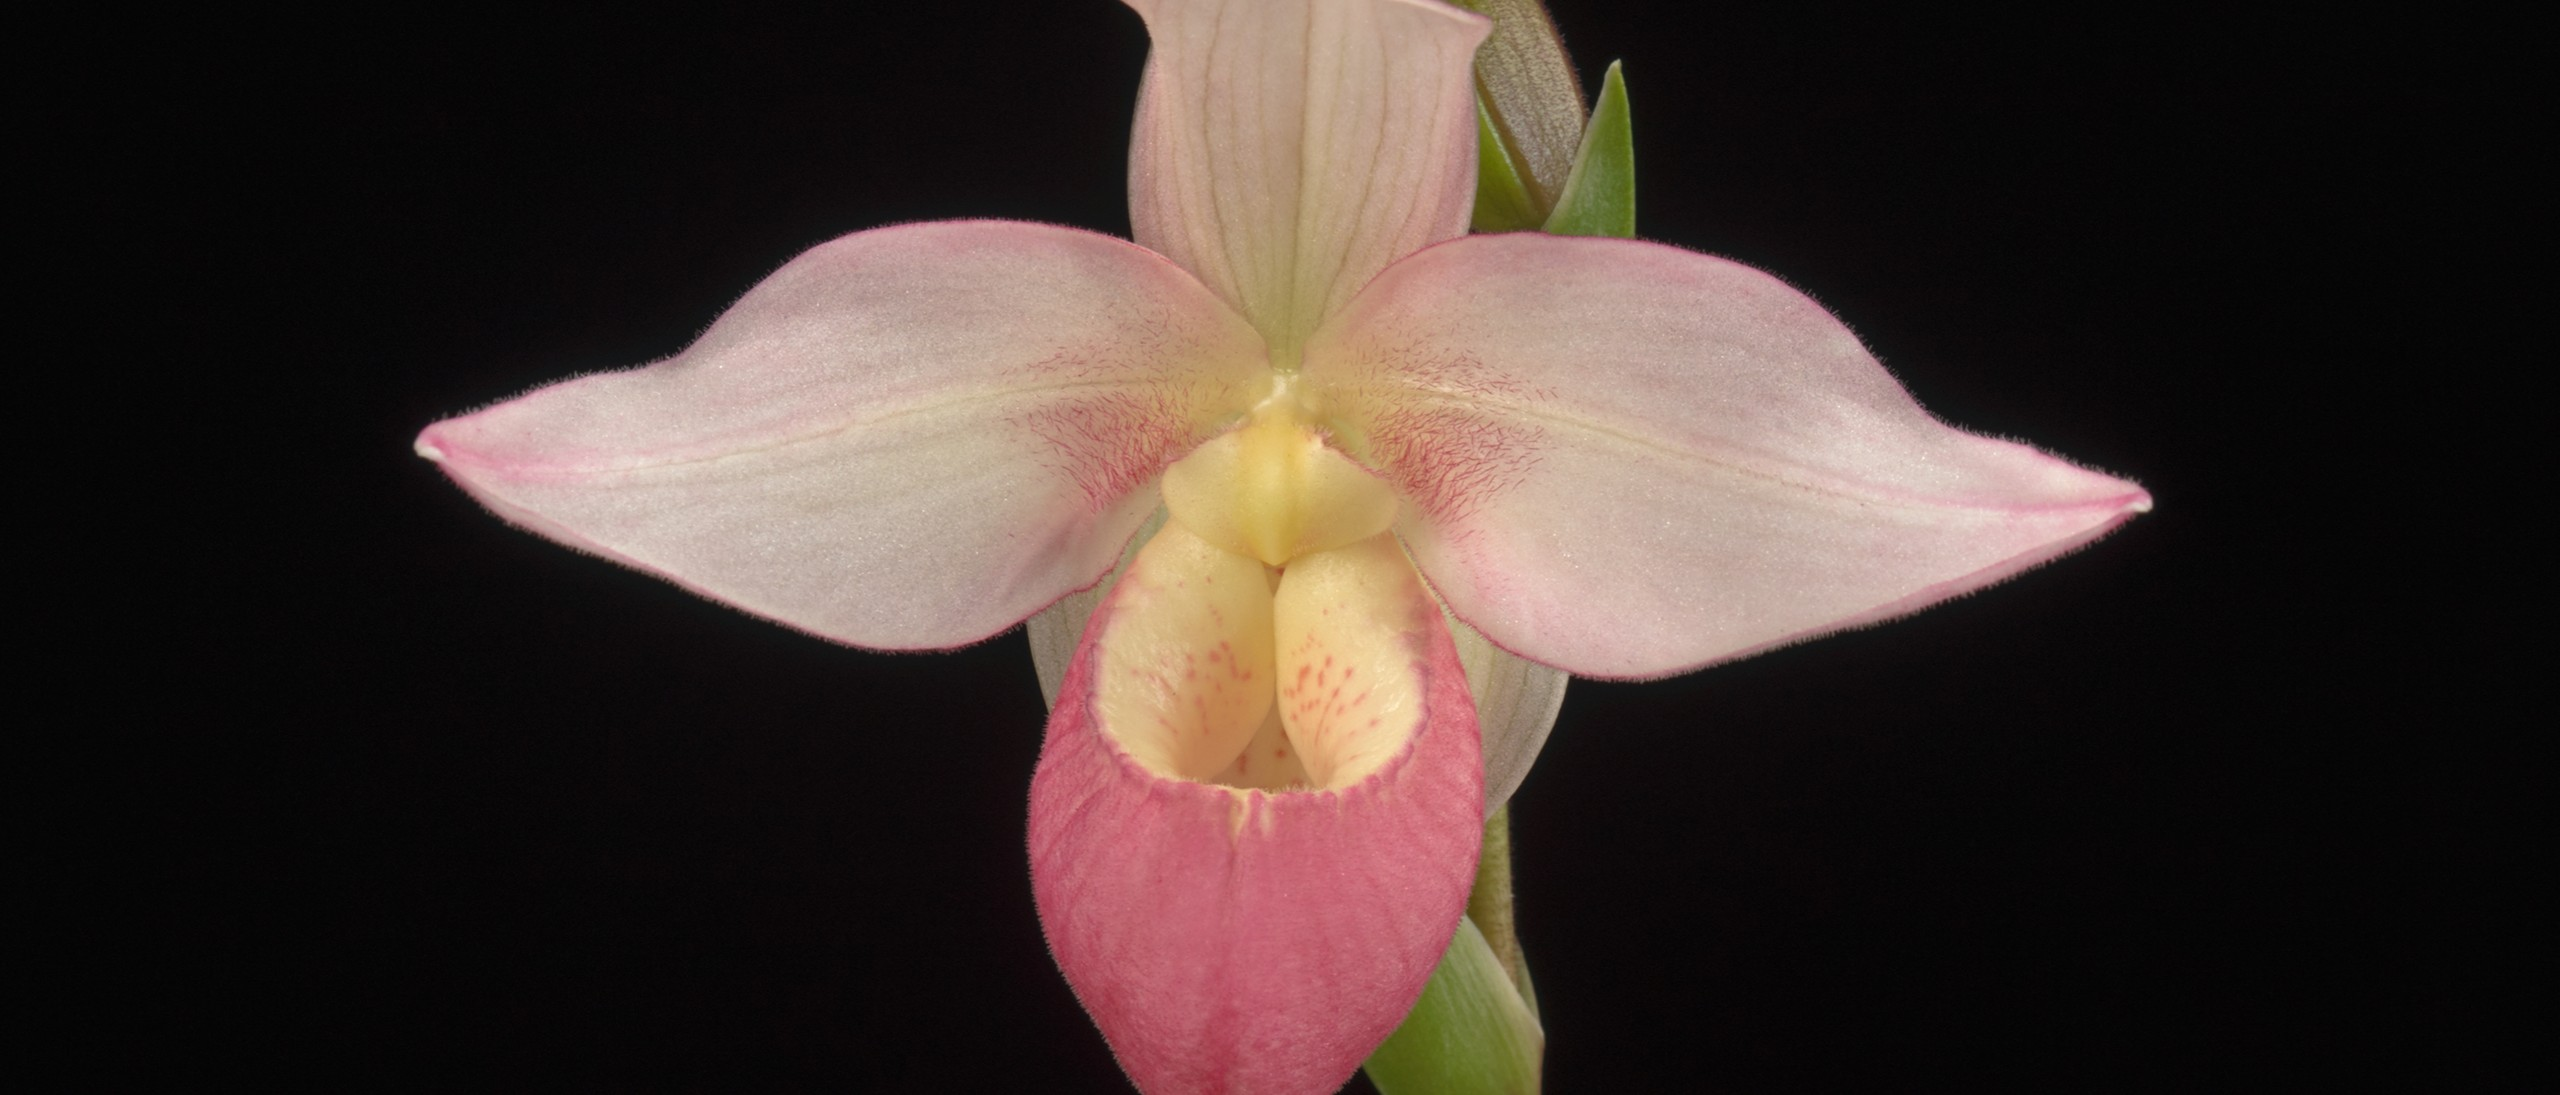 Phragmidpedium orchid pink flower form